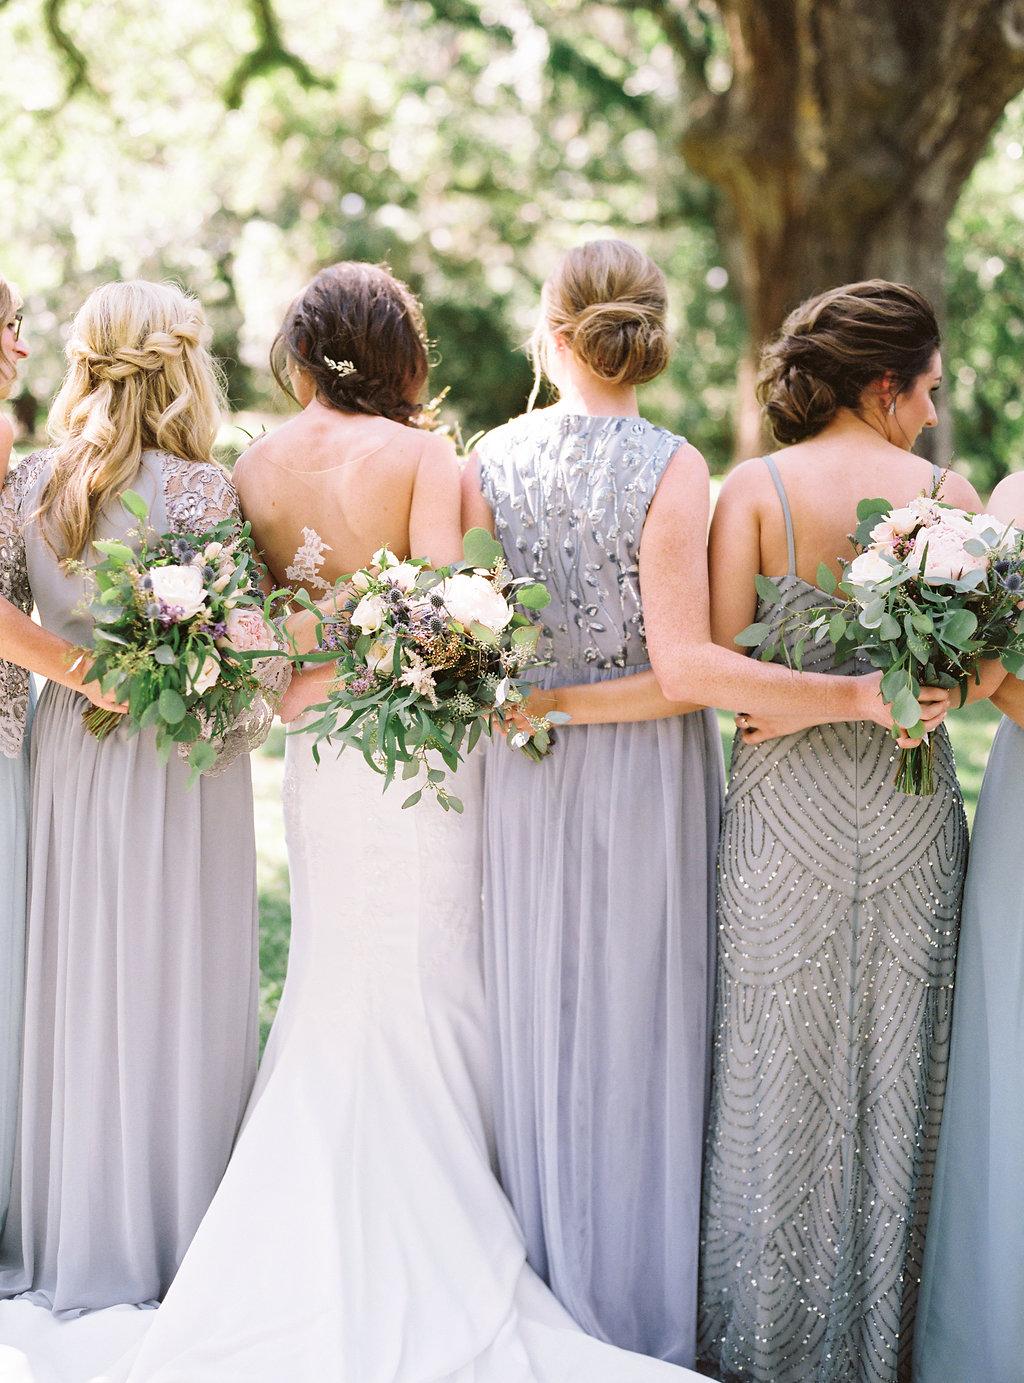 Wedding Save or Splurge?